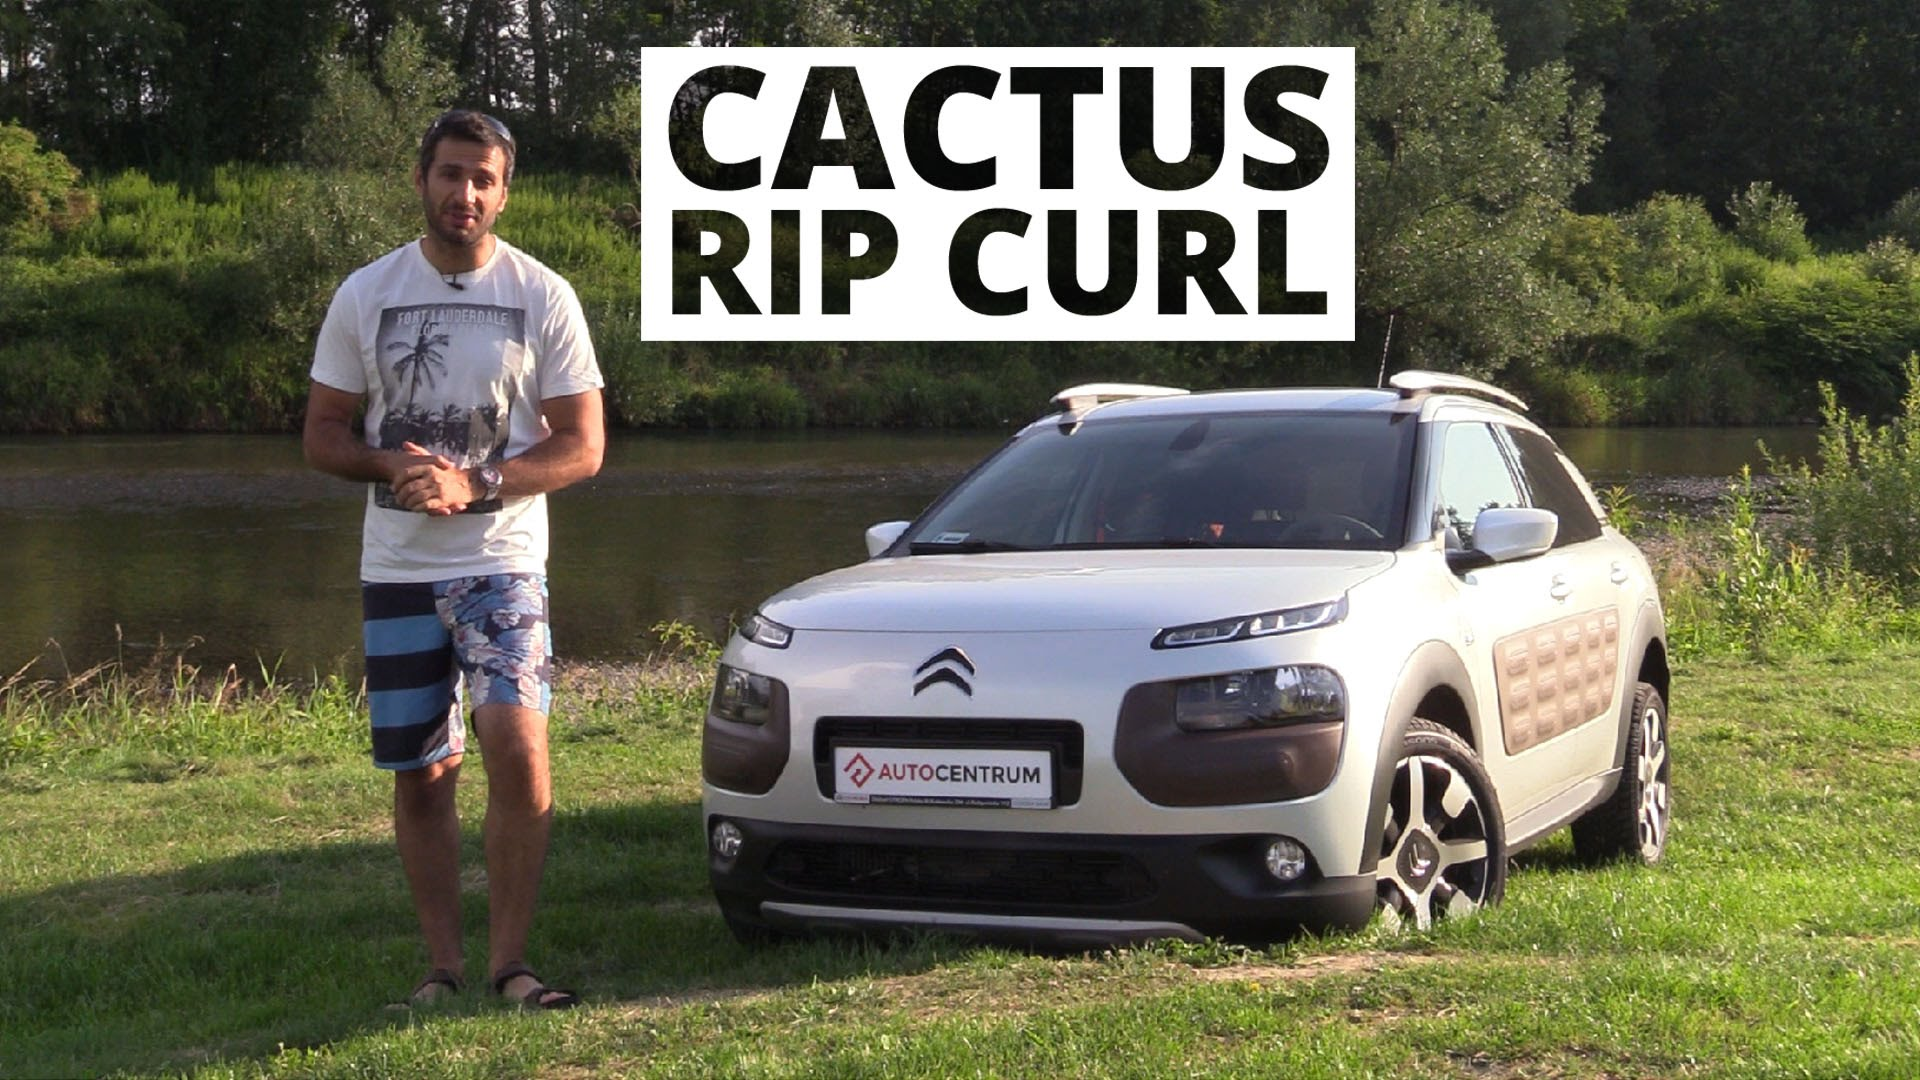 Citroen C4 Cactus Rip Curl 1.6 BlueHDI 100 KM, 2016 - test ...